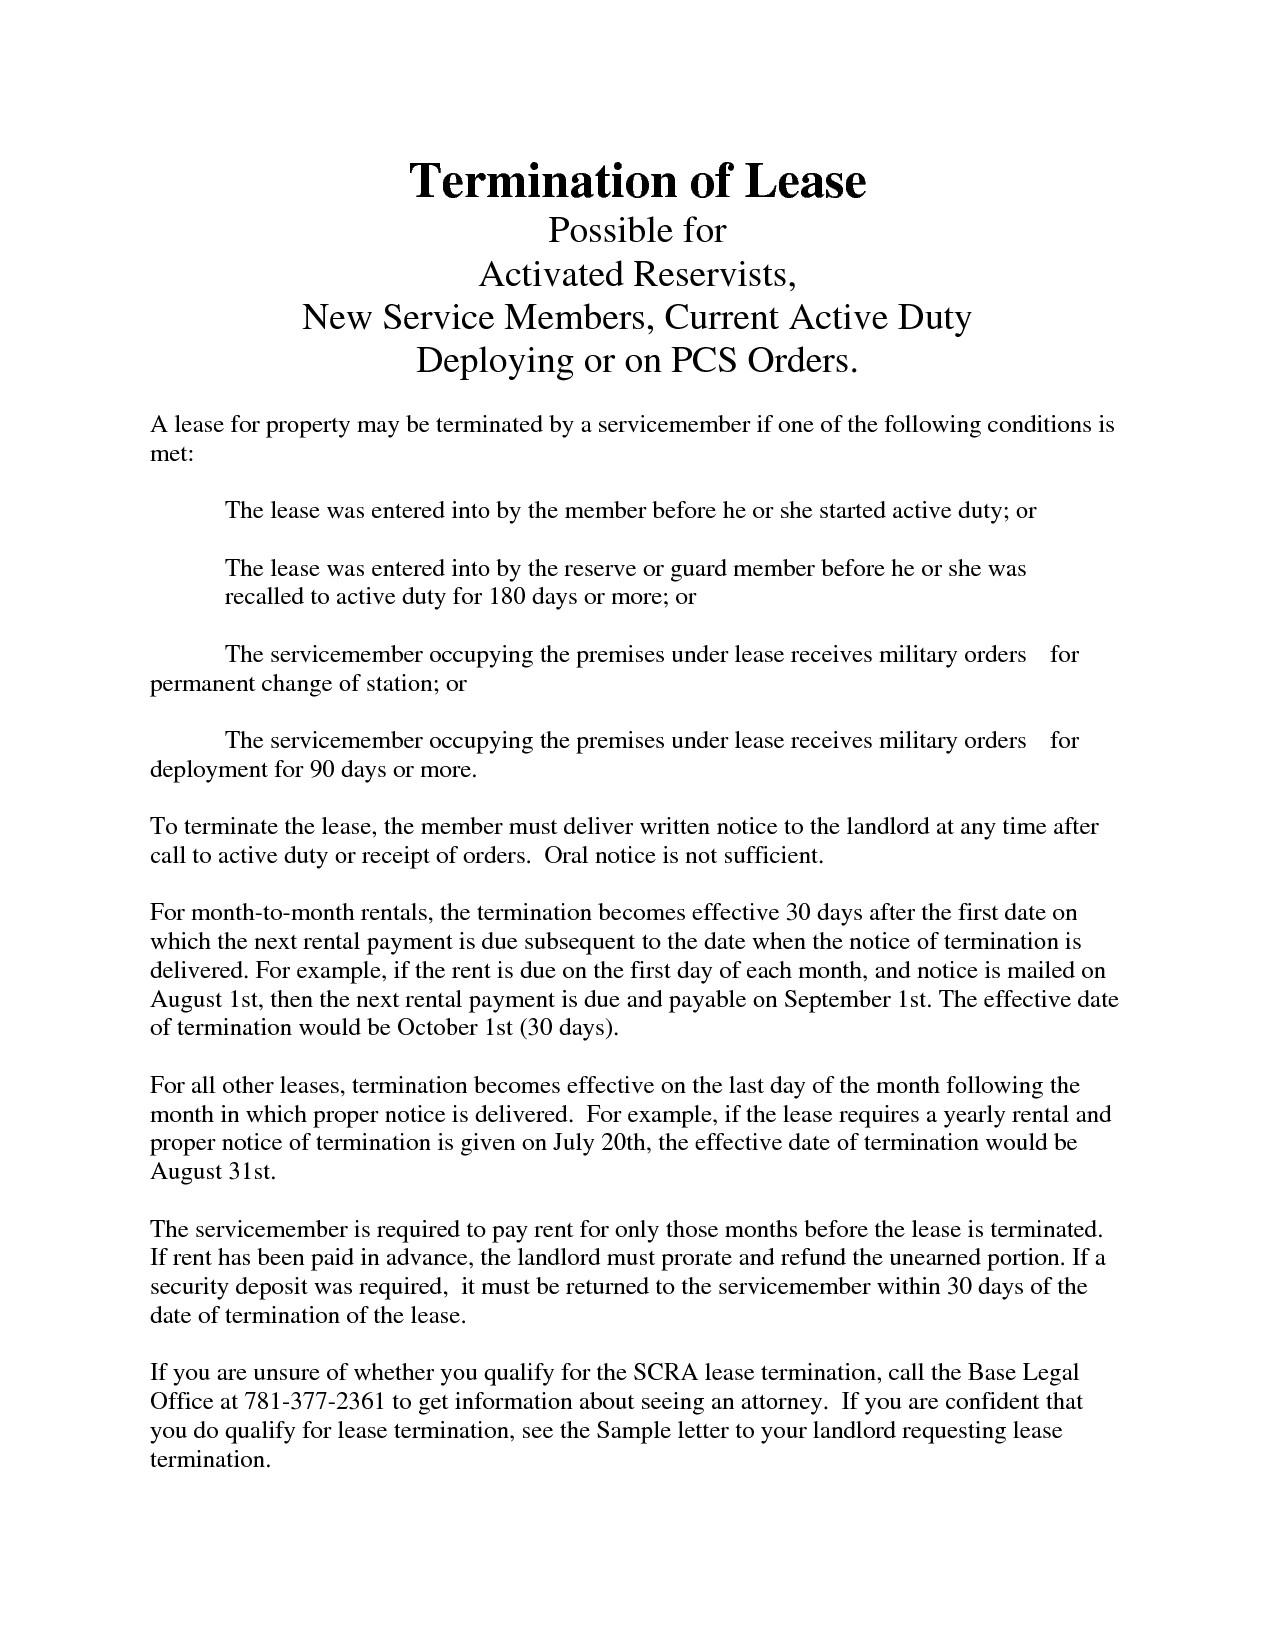 Renters Insurance Letter Template - 20 Unique 60 Day Notice Termination Tenancy Template